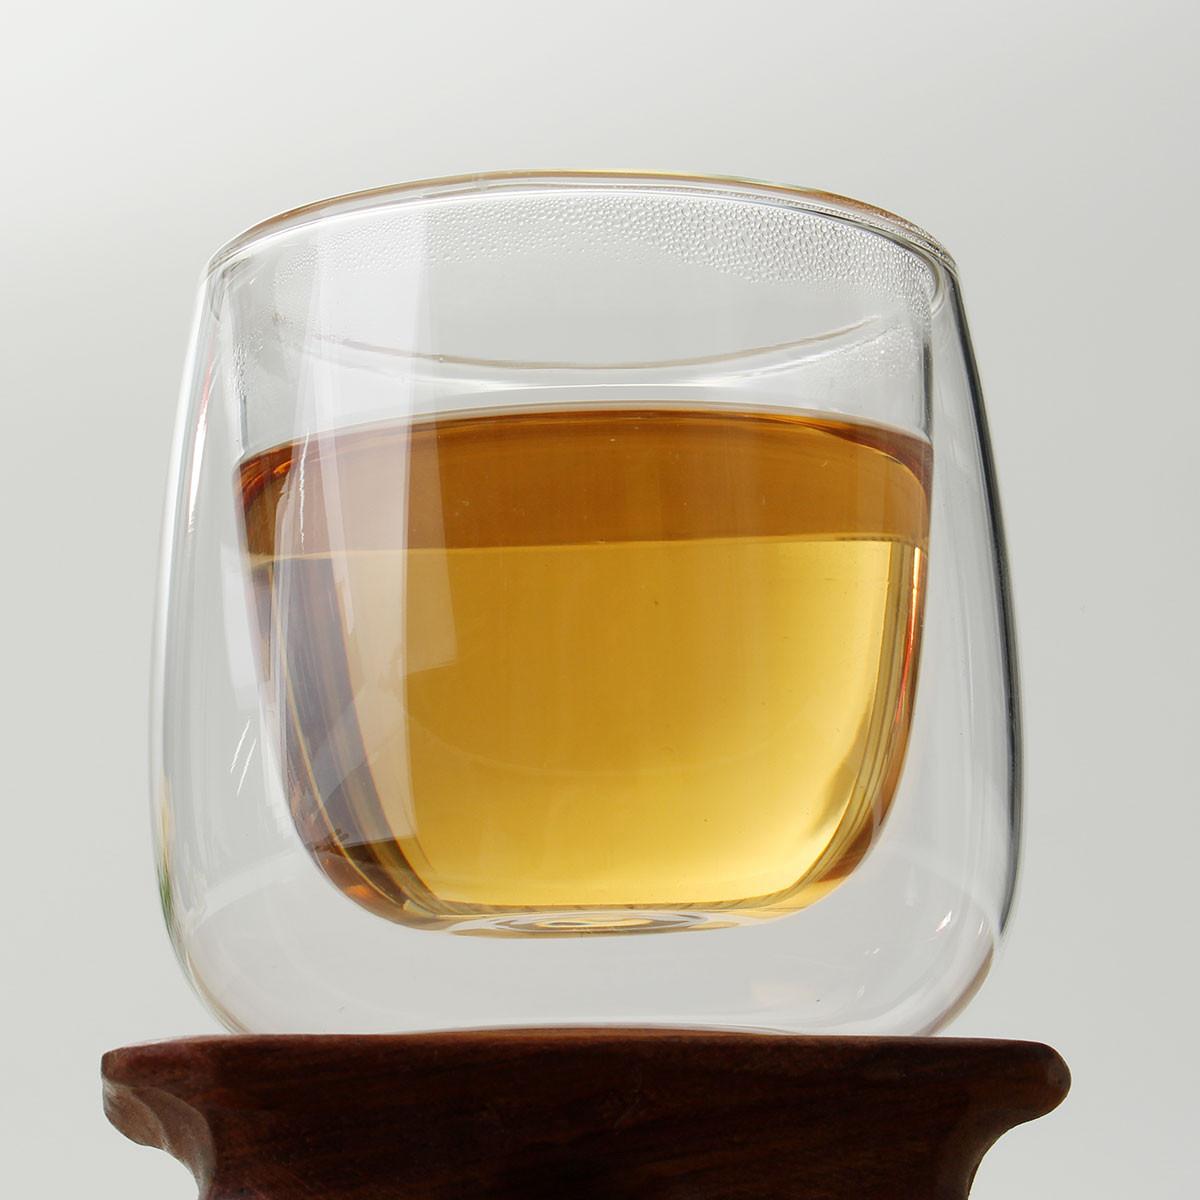 100ml Heat Resistance Double Wall Glass Cup Double Layer Glass Kungfu Tea Cup Coffee Milk Juice Healthy Drink Mug Mini Teapot(China (Mainland))